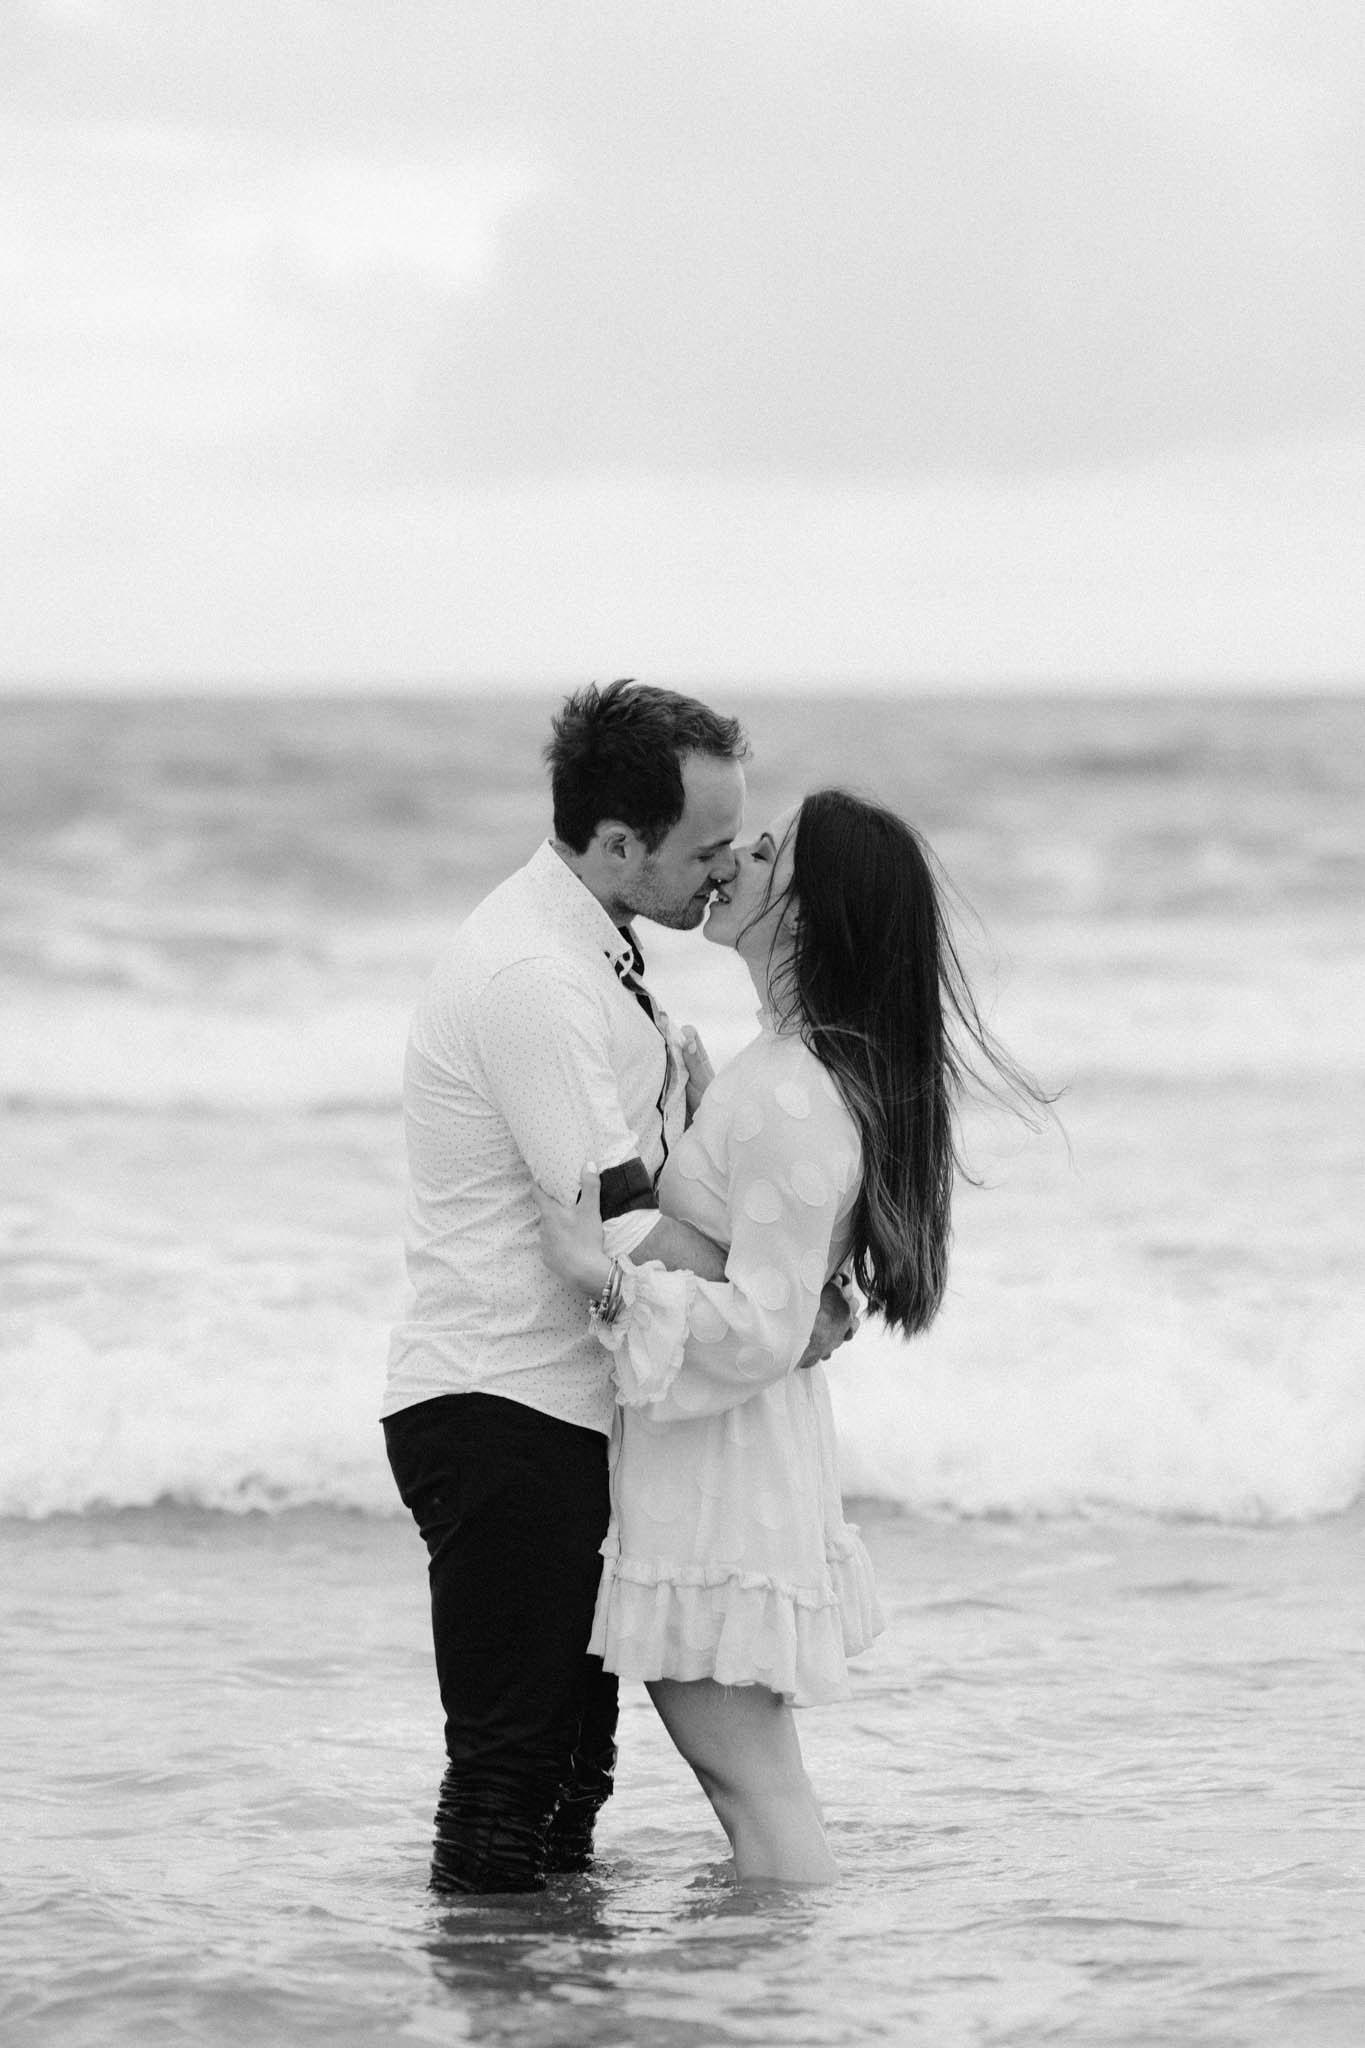 newfound-e-m-mt-maunganui-tauranga-wedding-photographer-035-a